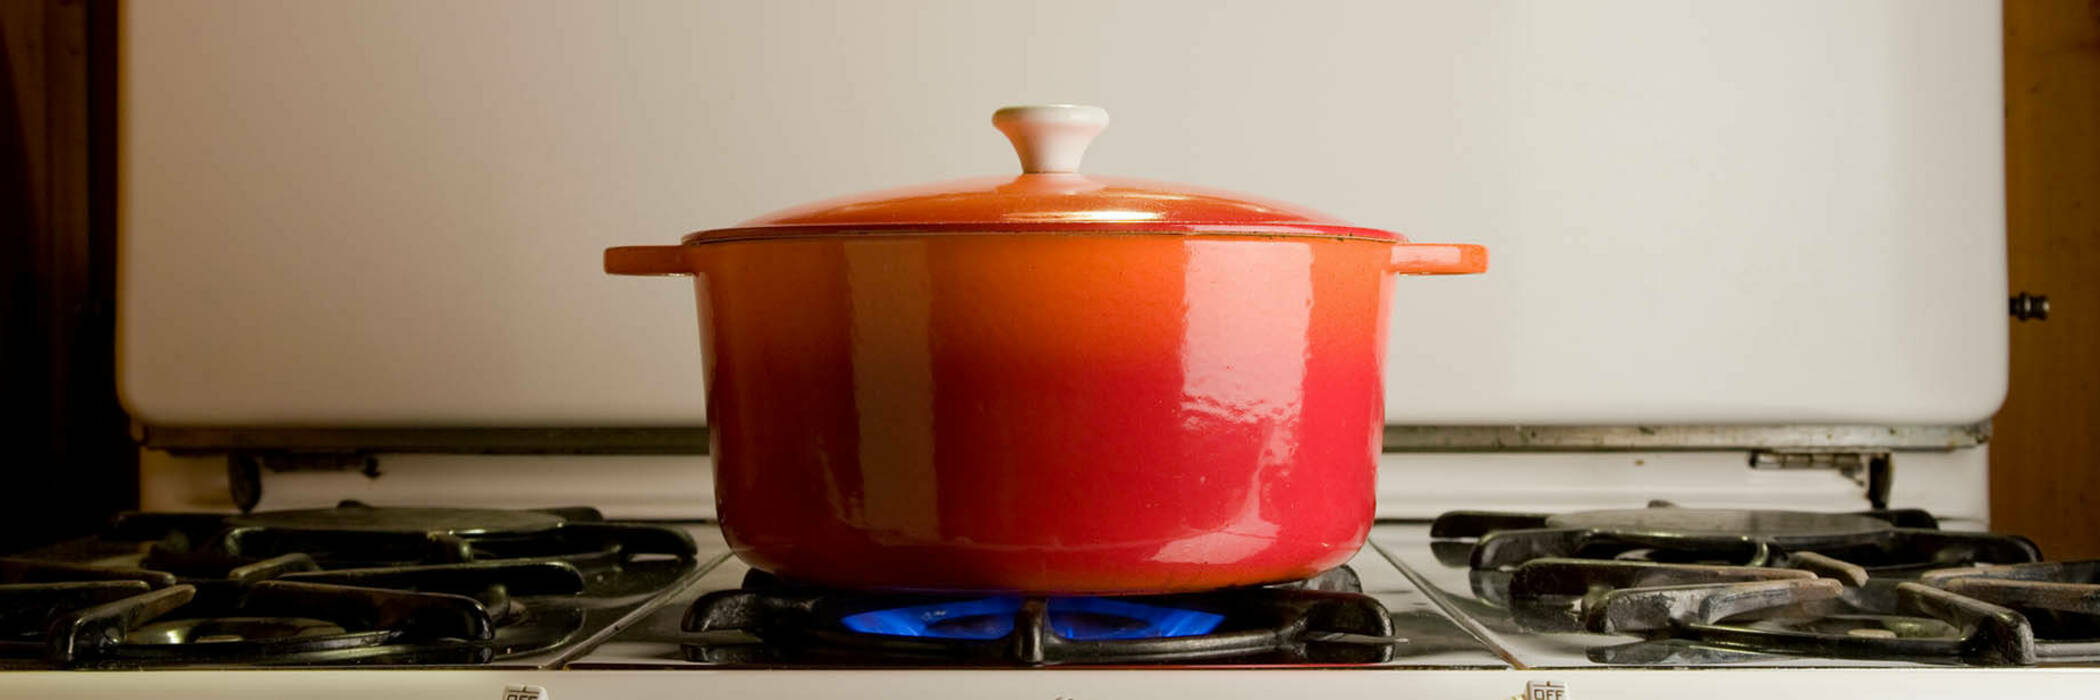 20apr casserole dishes hero